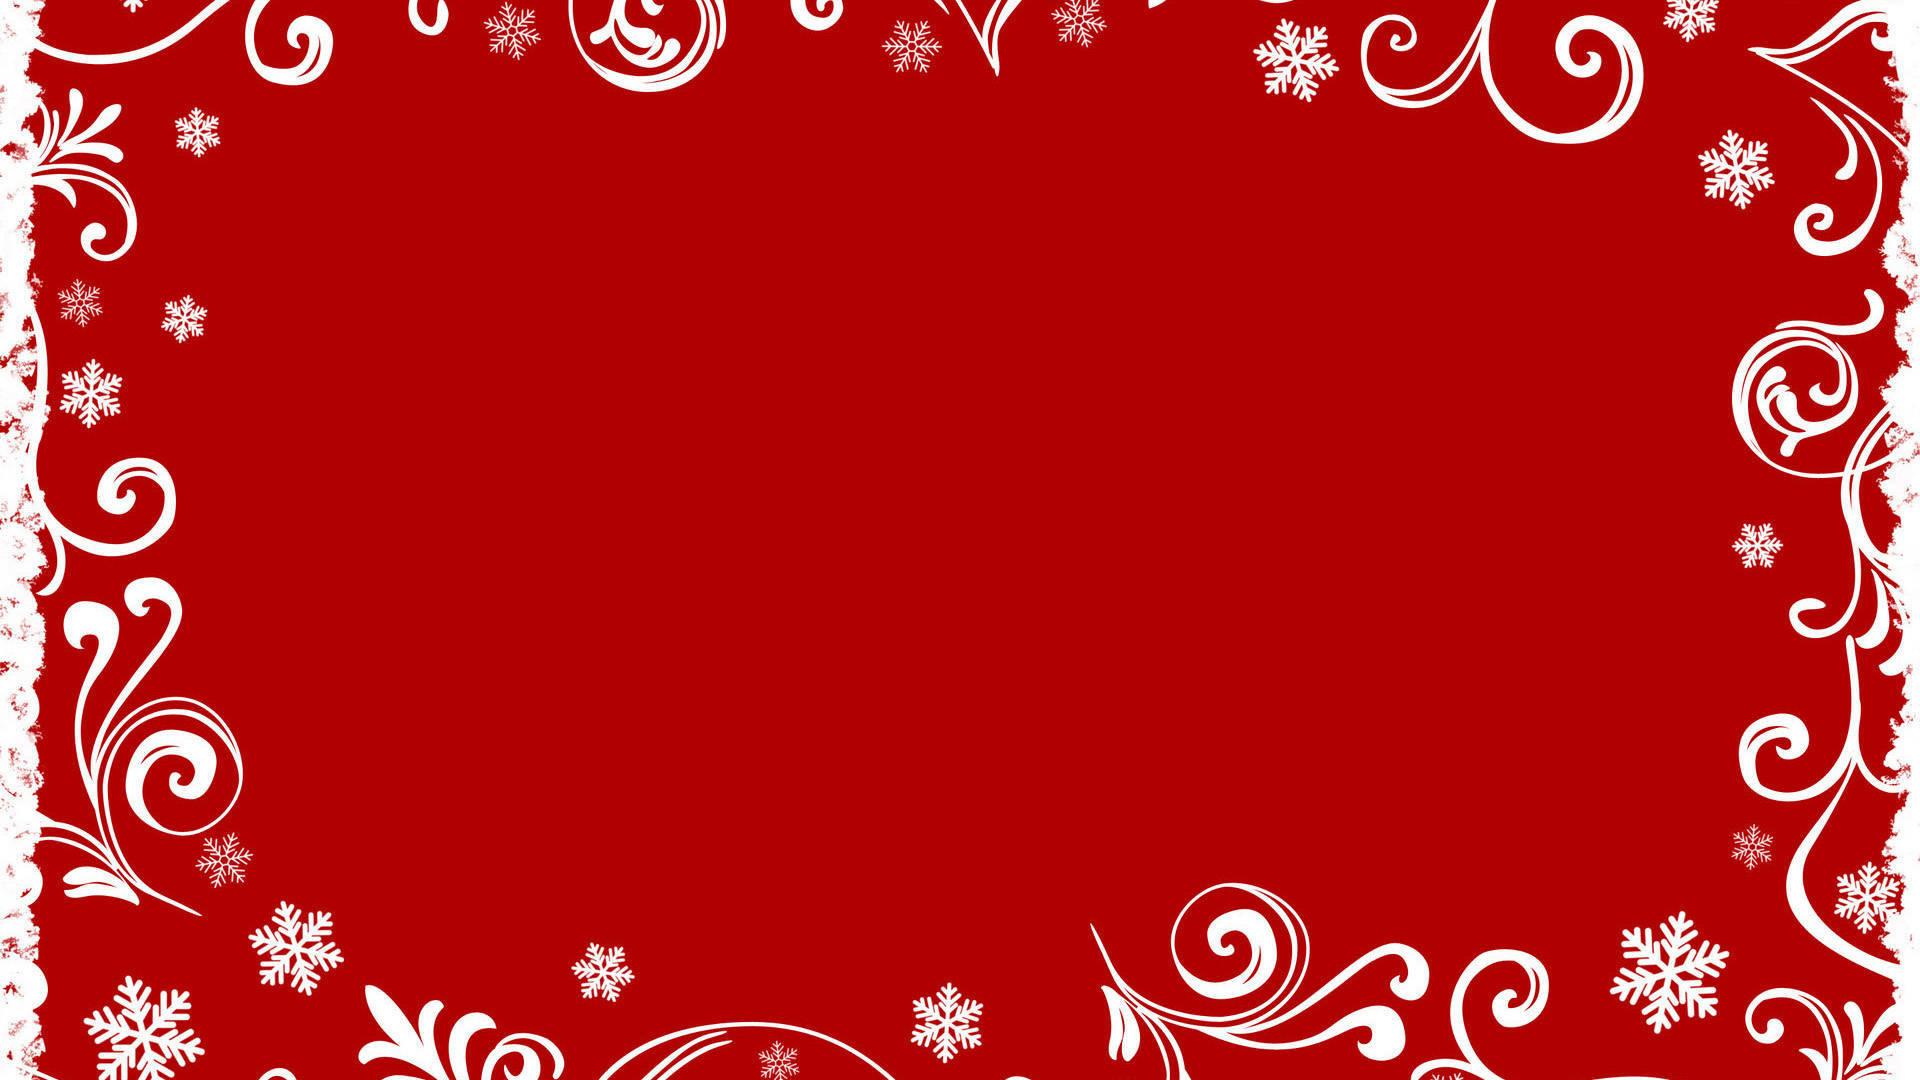 Christmas succinct theme red wallpaper HD wallpaper 1920x1080